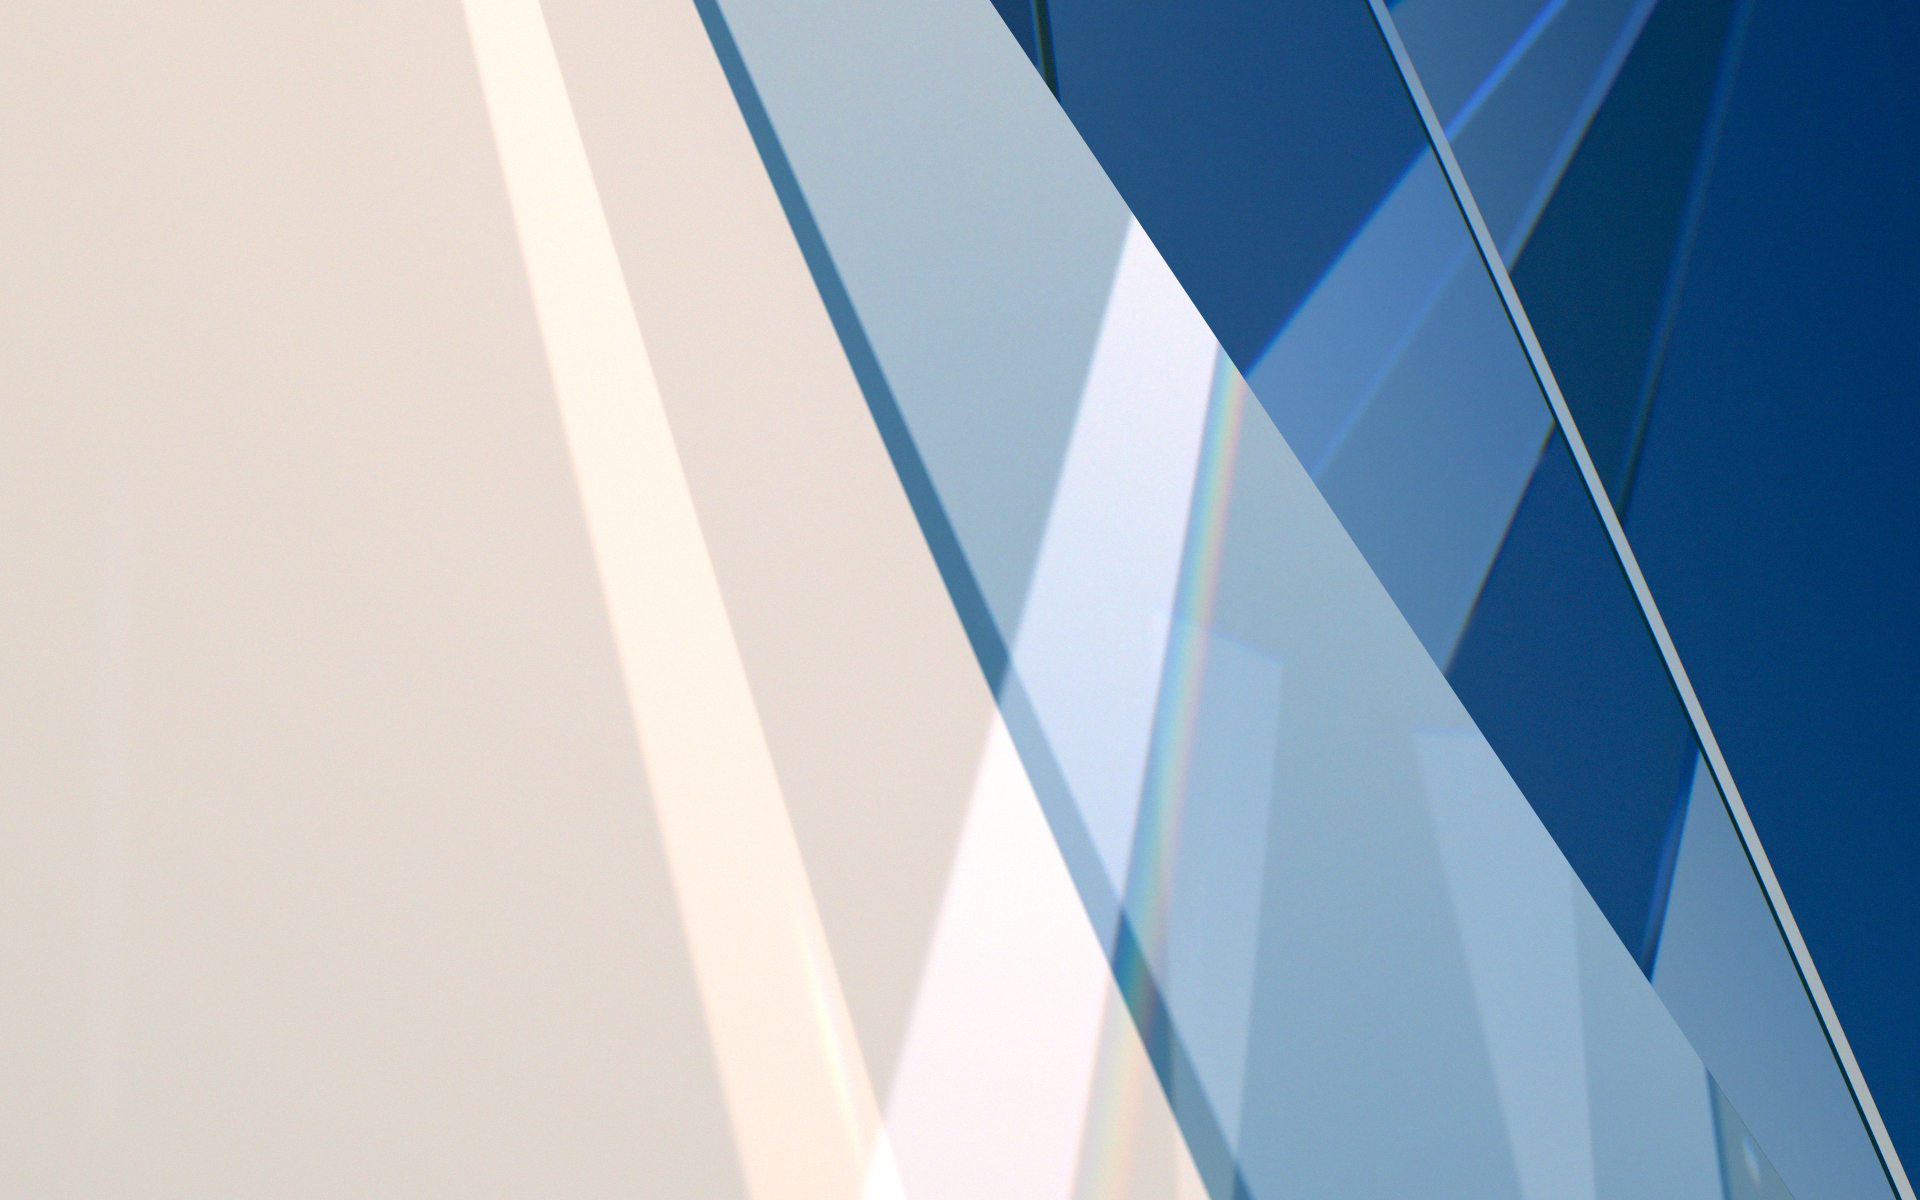 Eskimo Square Glass Prism_0015_Glass Prism 05.jpg